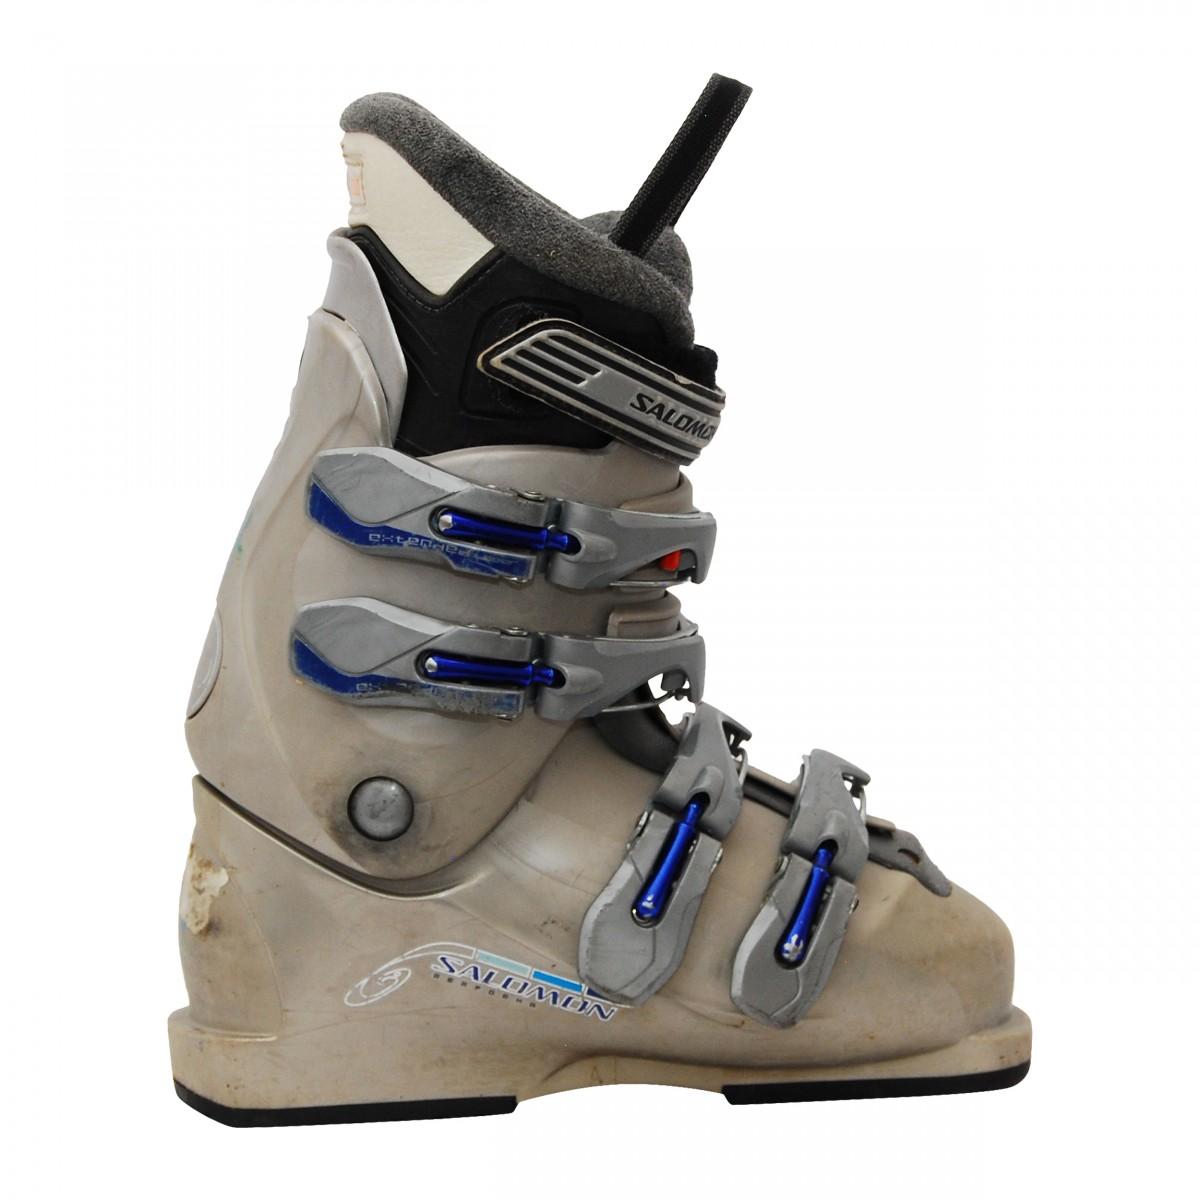 newest 6454c 52288 Chaussure de ski occasion Salomon performa beige